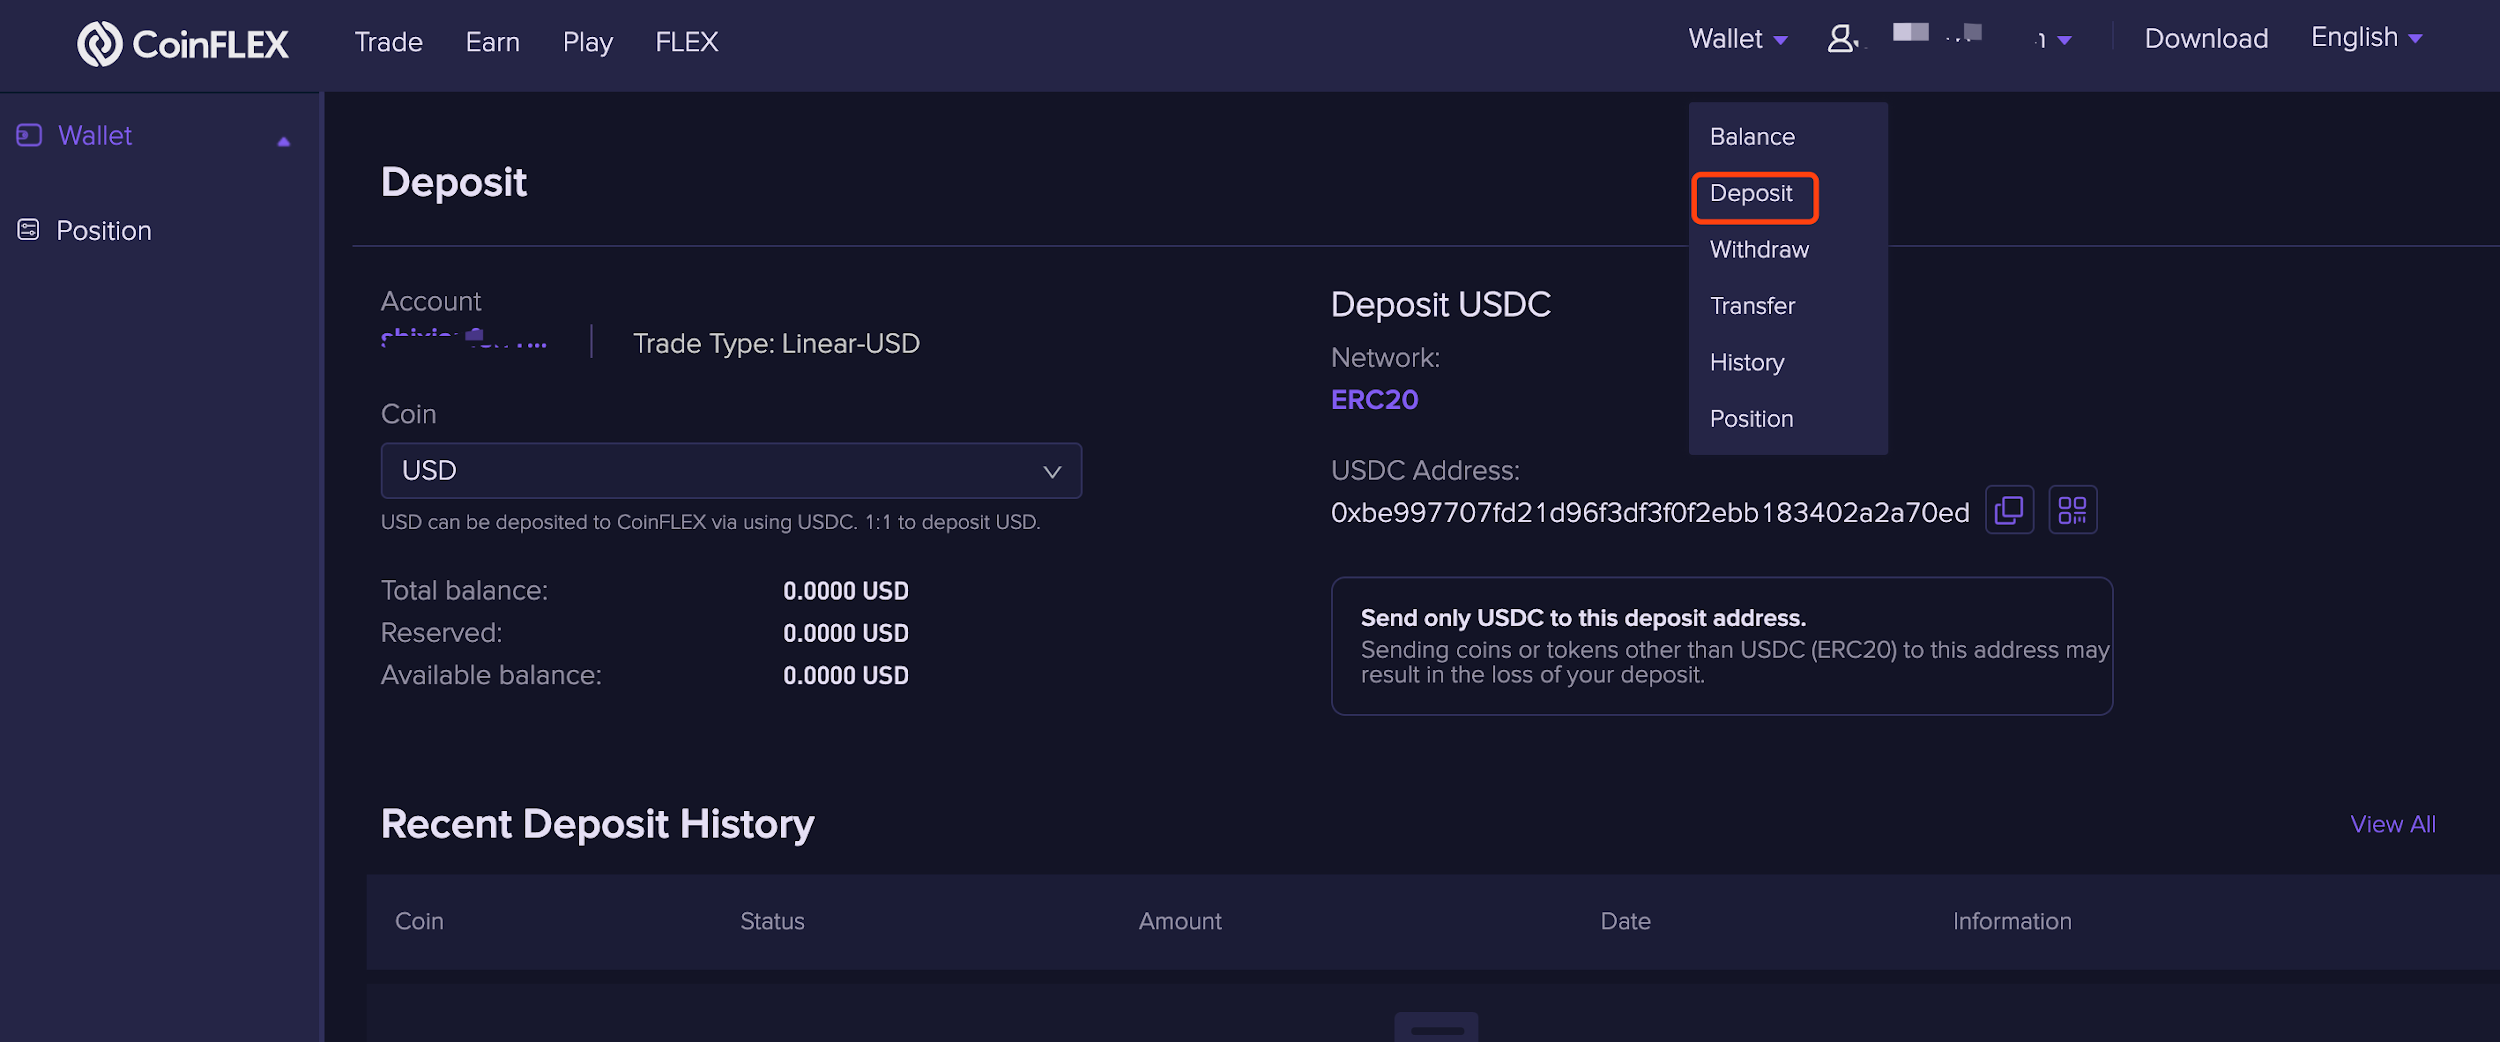 deposit 1.1.4 Depositing funds